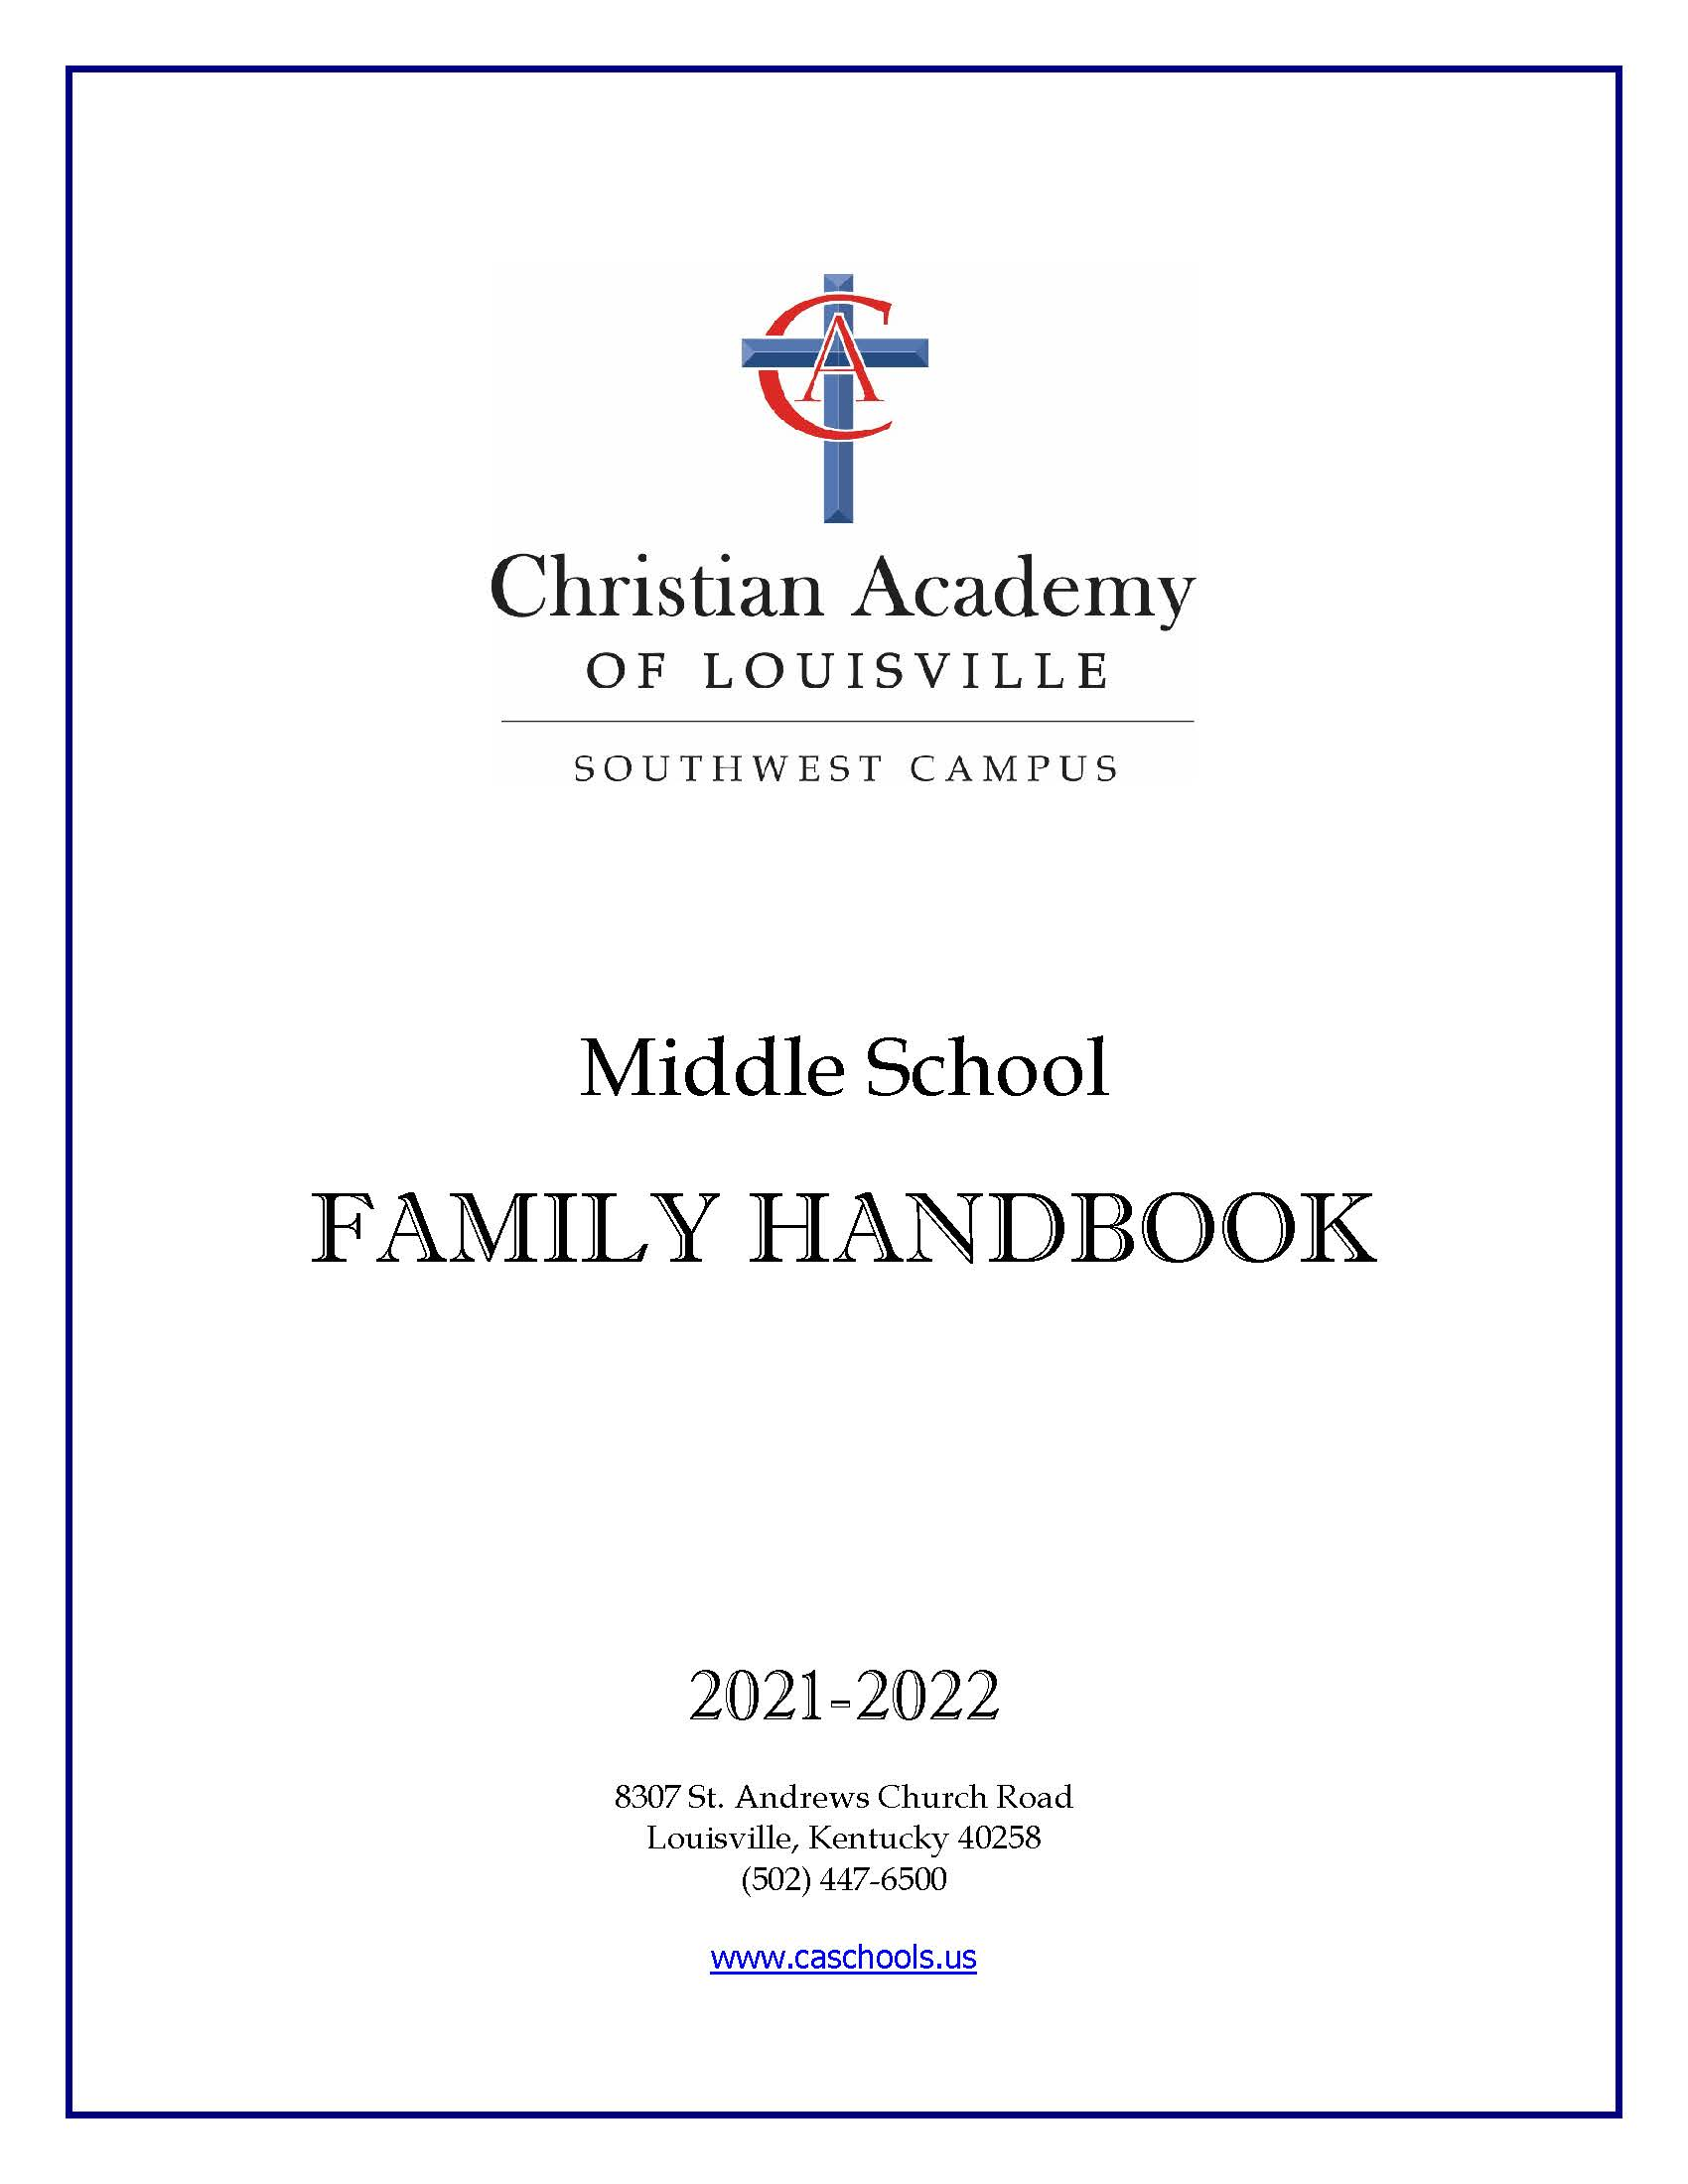 Christian Academy School System | Christian Academy of Louisville - Southwest Middle School | 2021-2022 Family Handbook